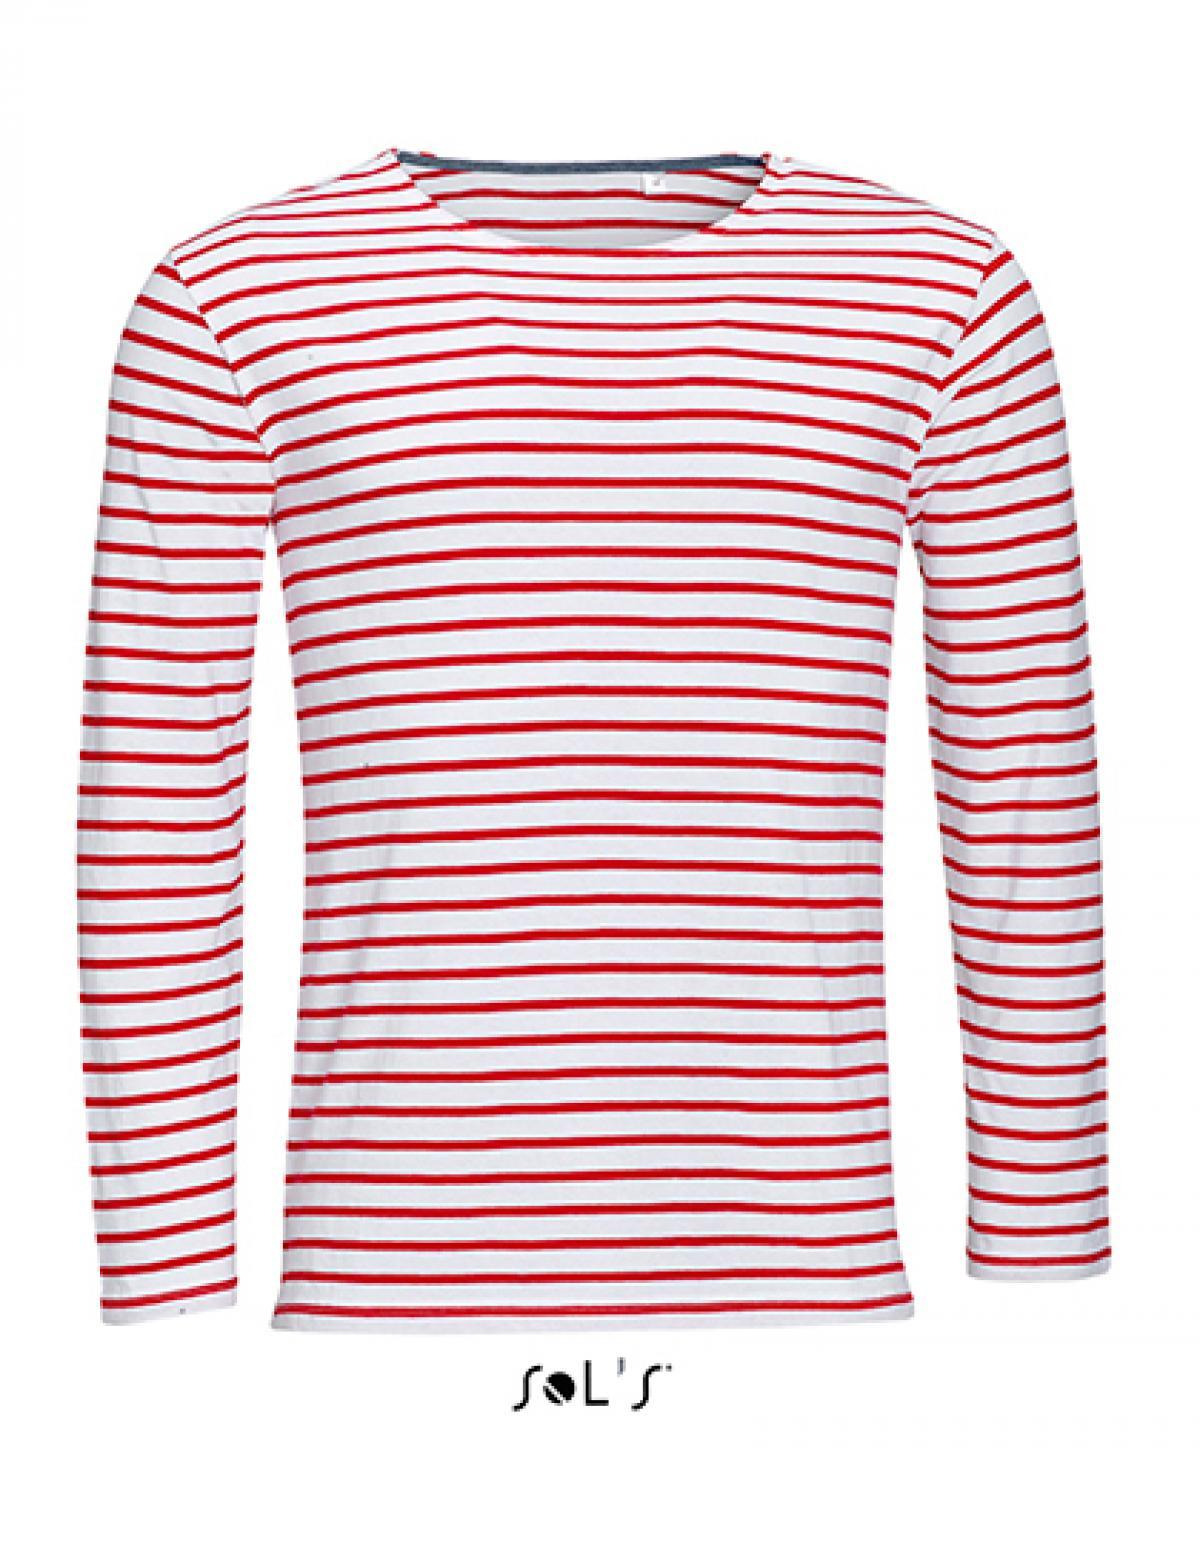 herren longsleeve striped t shirt marine gestreift. Black Bedroom Furniture Sets. Home Design Ideas